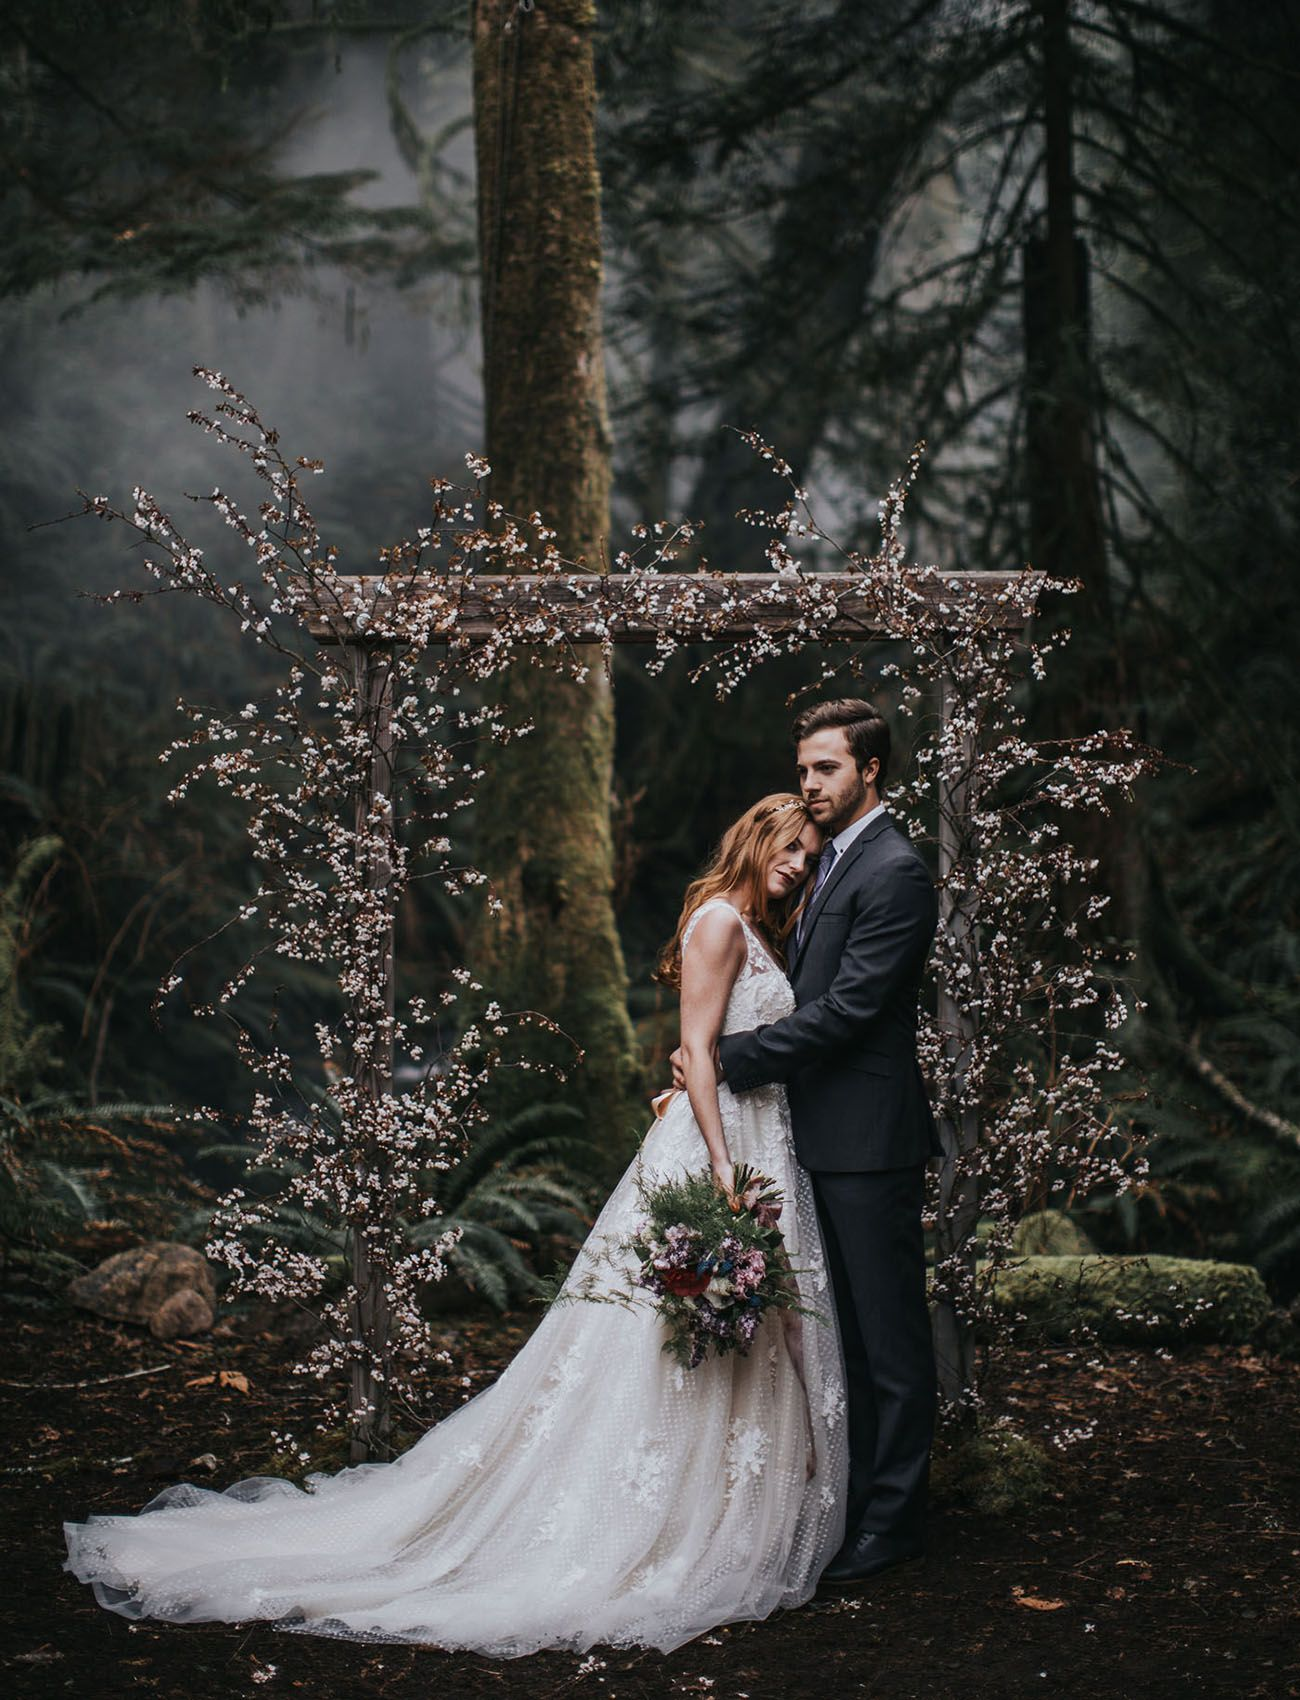 Into The Woods An Enchanted Elopement Shoot Modern Inspiration